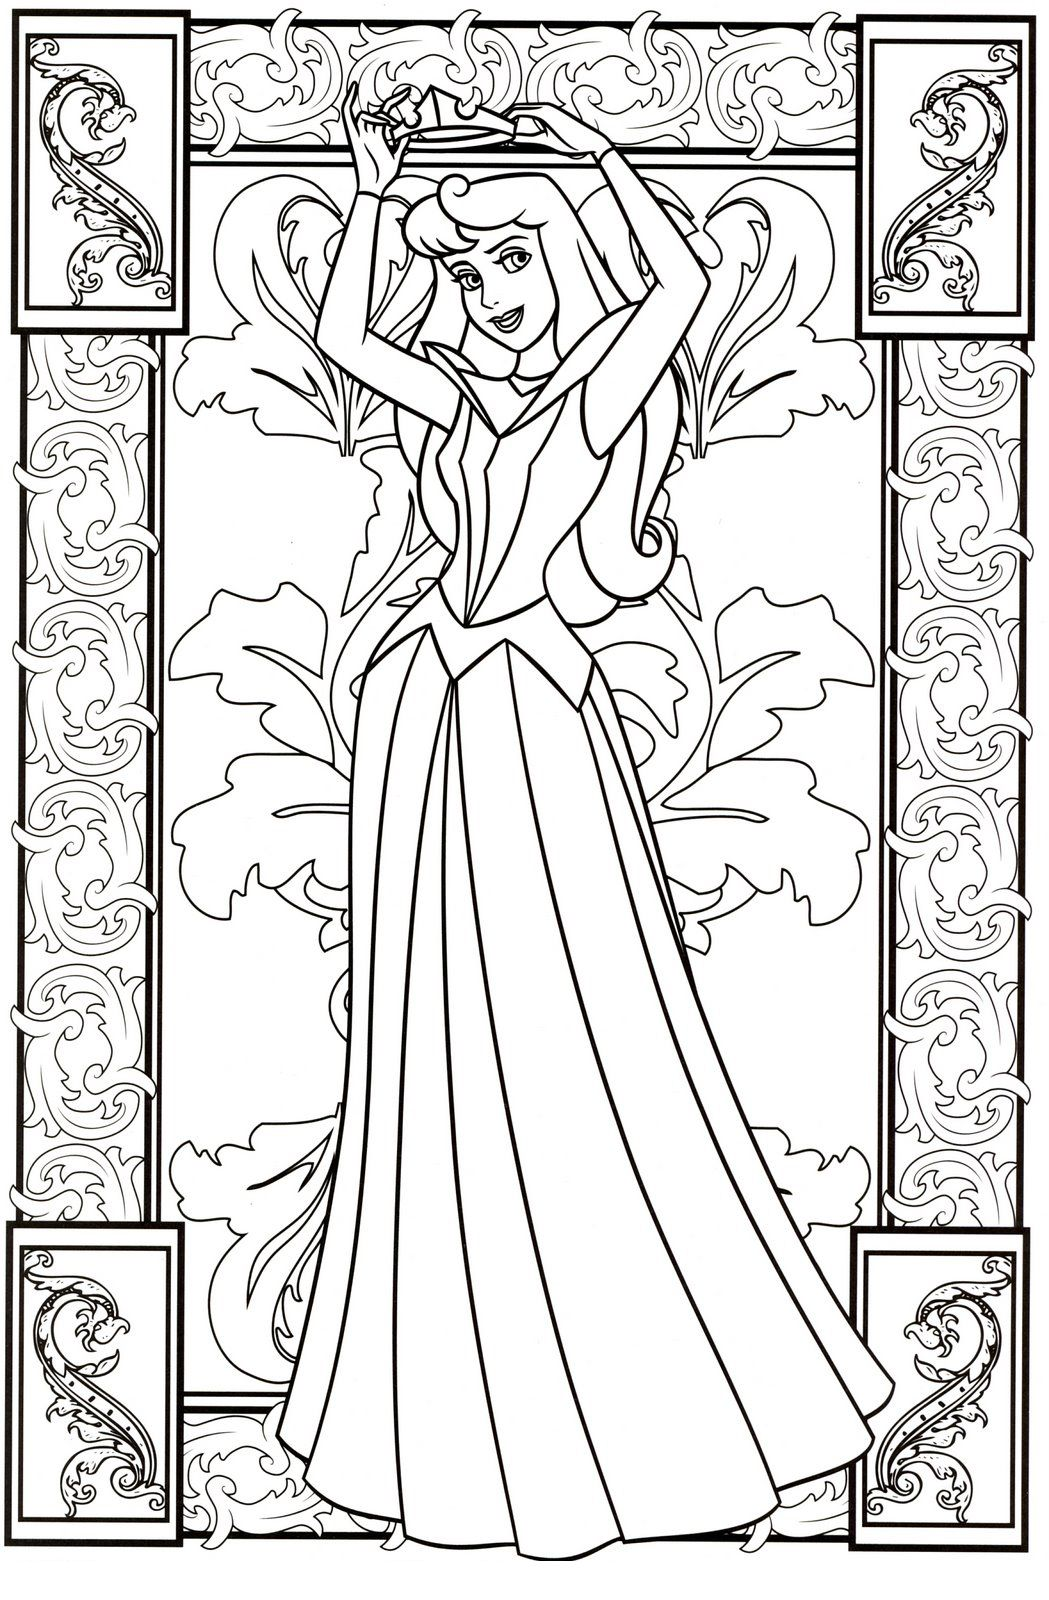 Sleeping Beauty Jpg 1049 1600 Disney Princess Coloring Pages Disney Coloring Pages Princess Coloring Pages